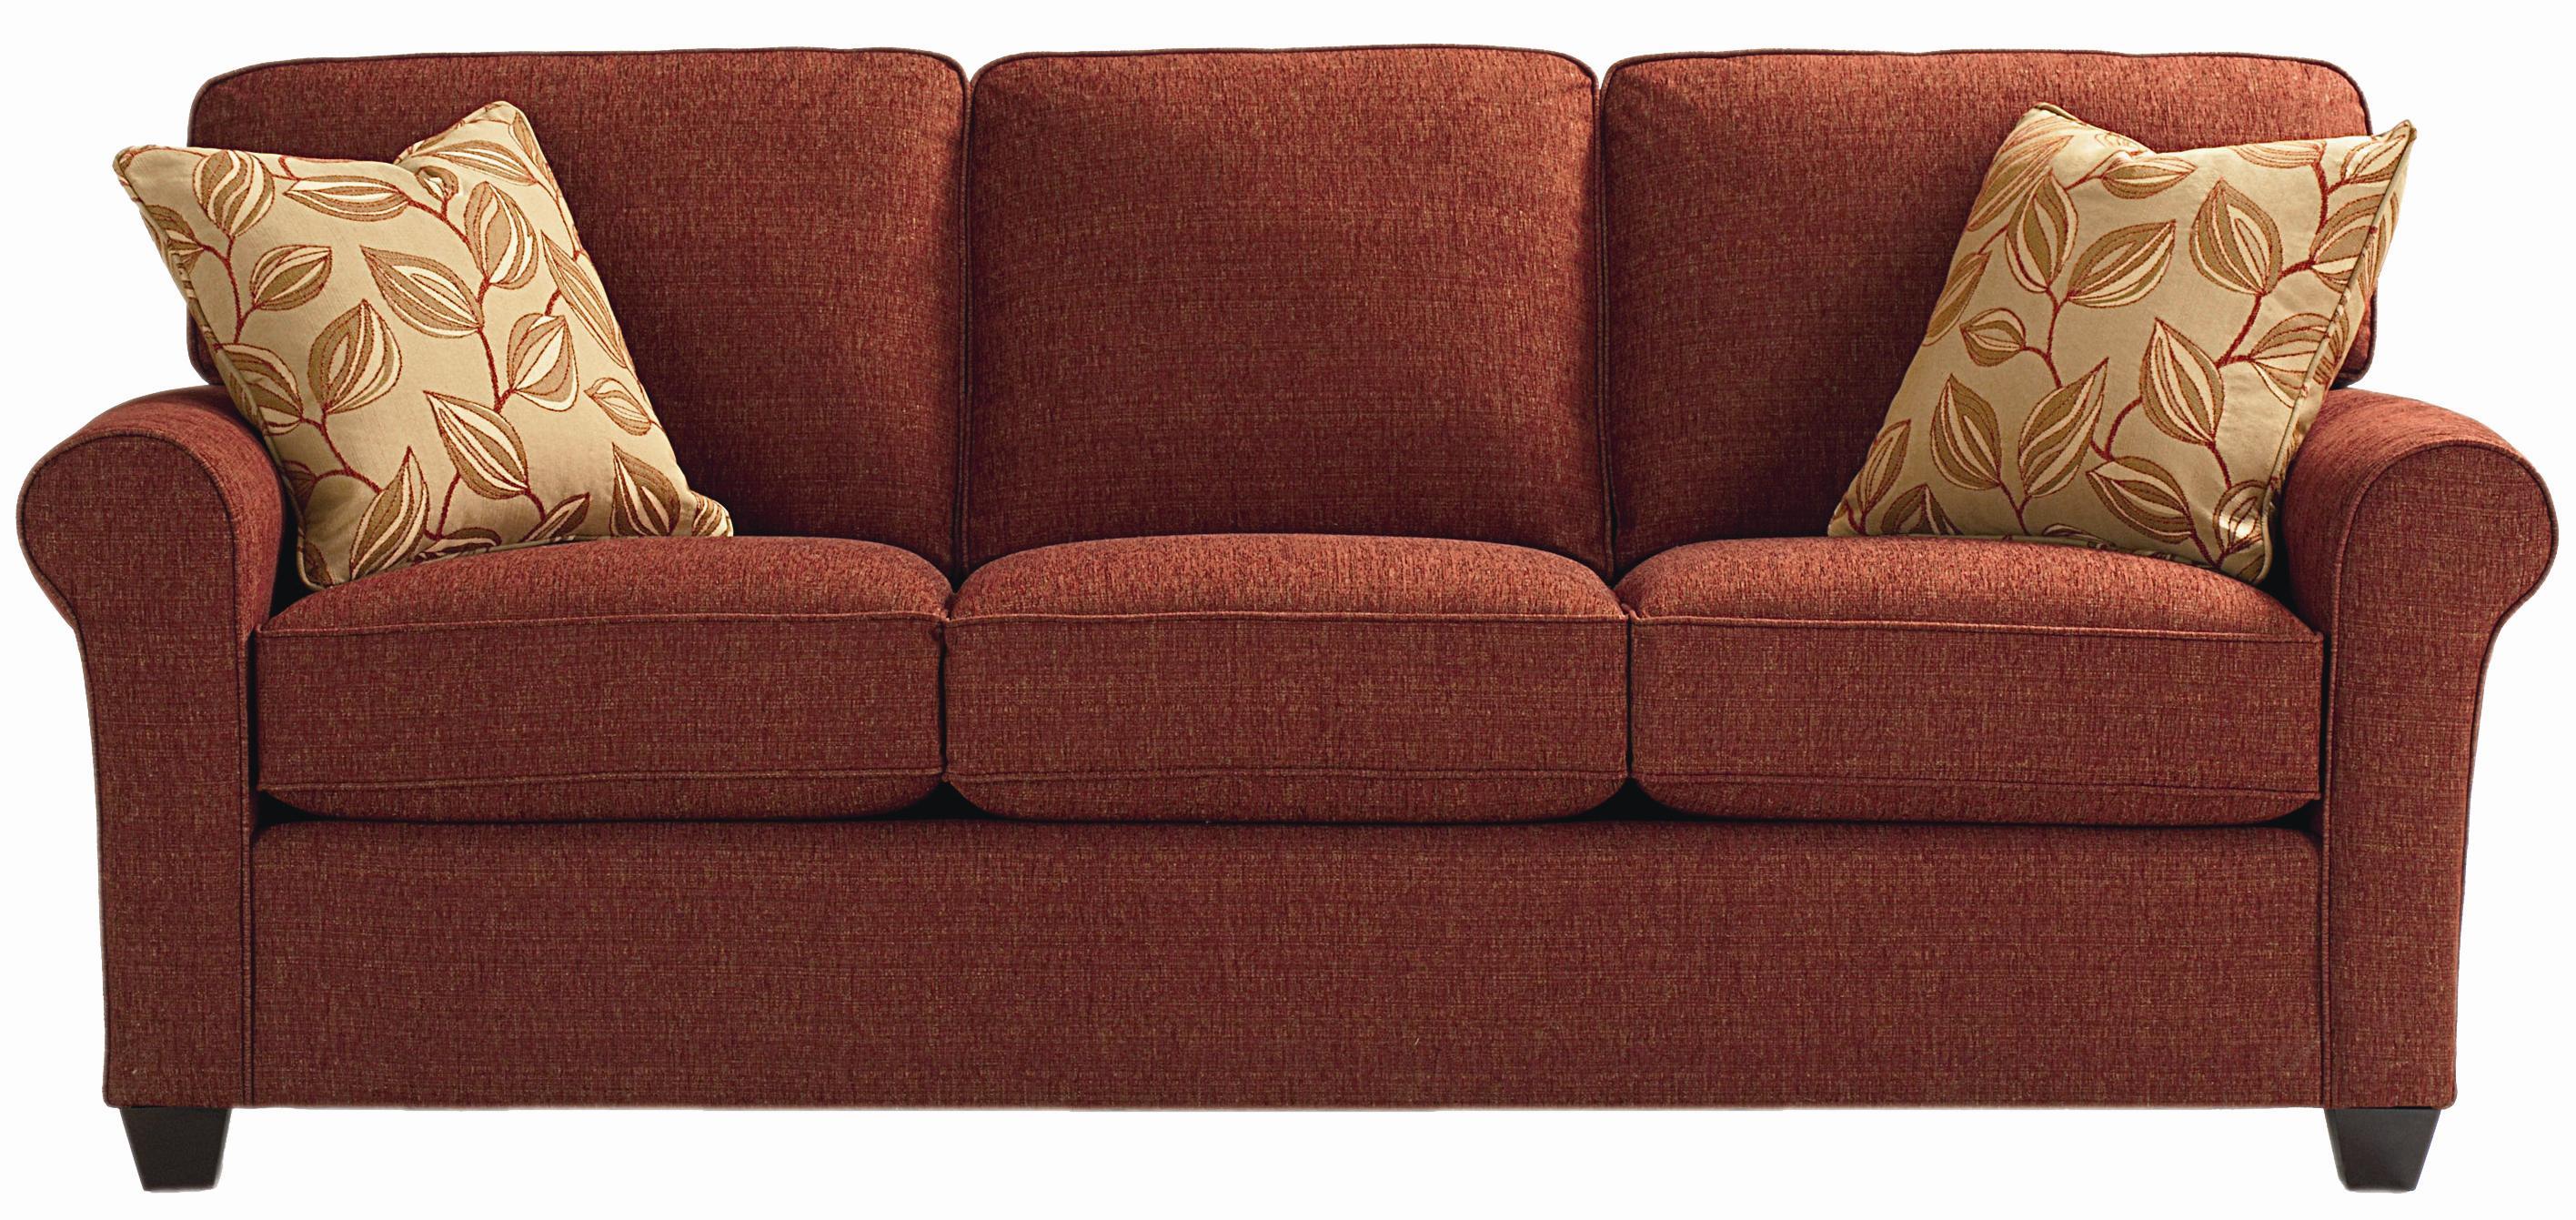 upholstered stationary sofa brewster by bassett wilcox furniture rh wilcoxfurniture com bassett brewster sofa price bassett brewster sofa reviews